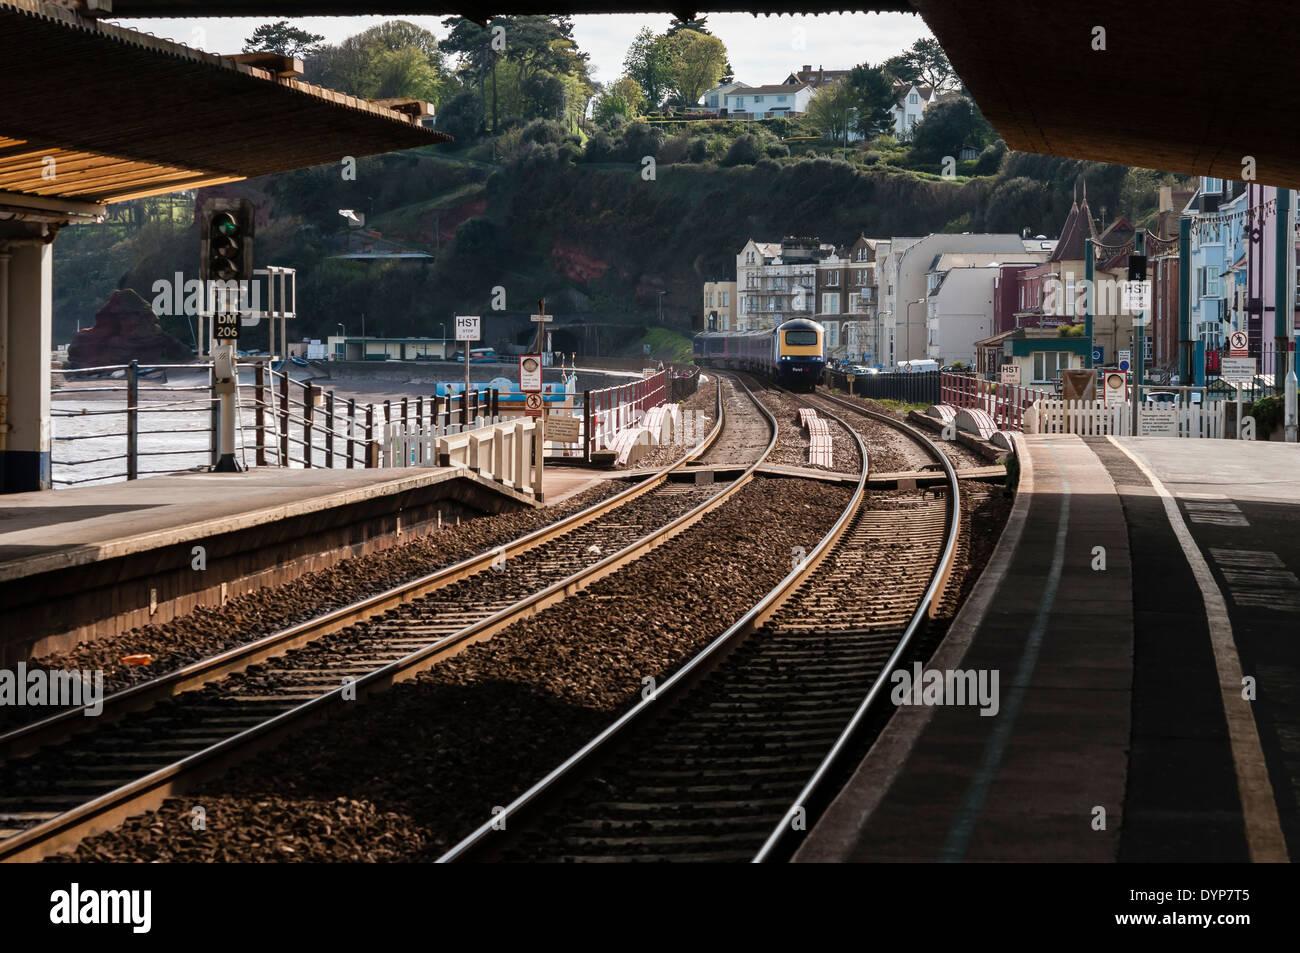 Train arriving at Dawlish station. - Stock Image